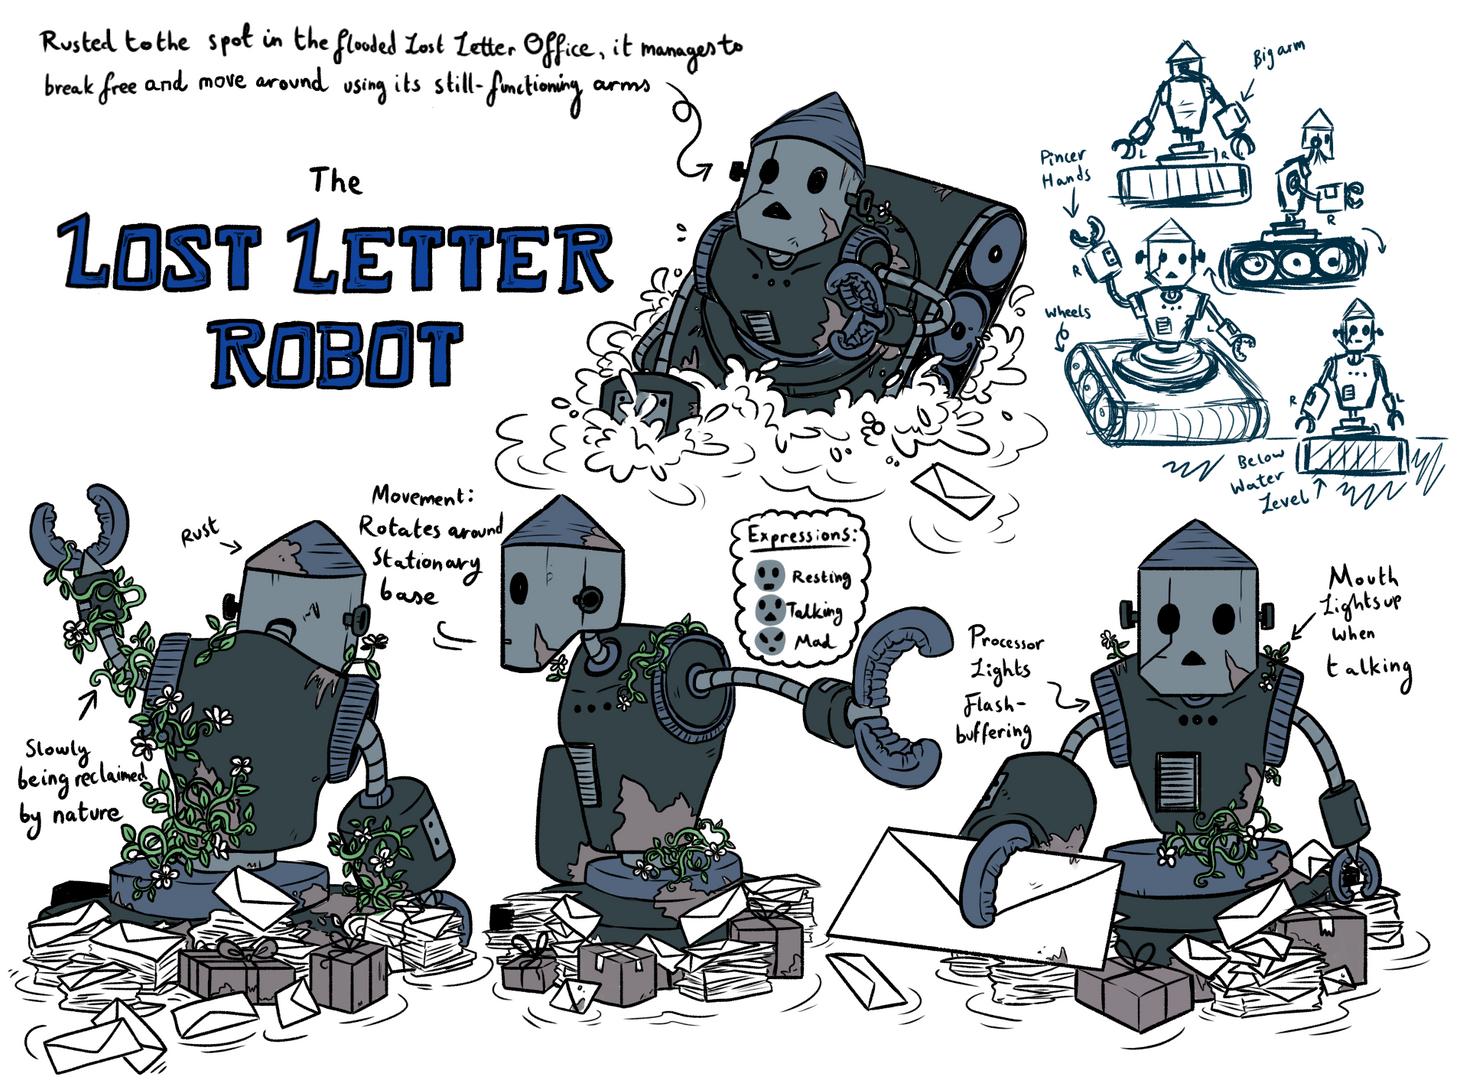 bots.png